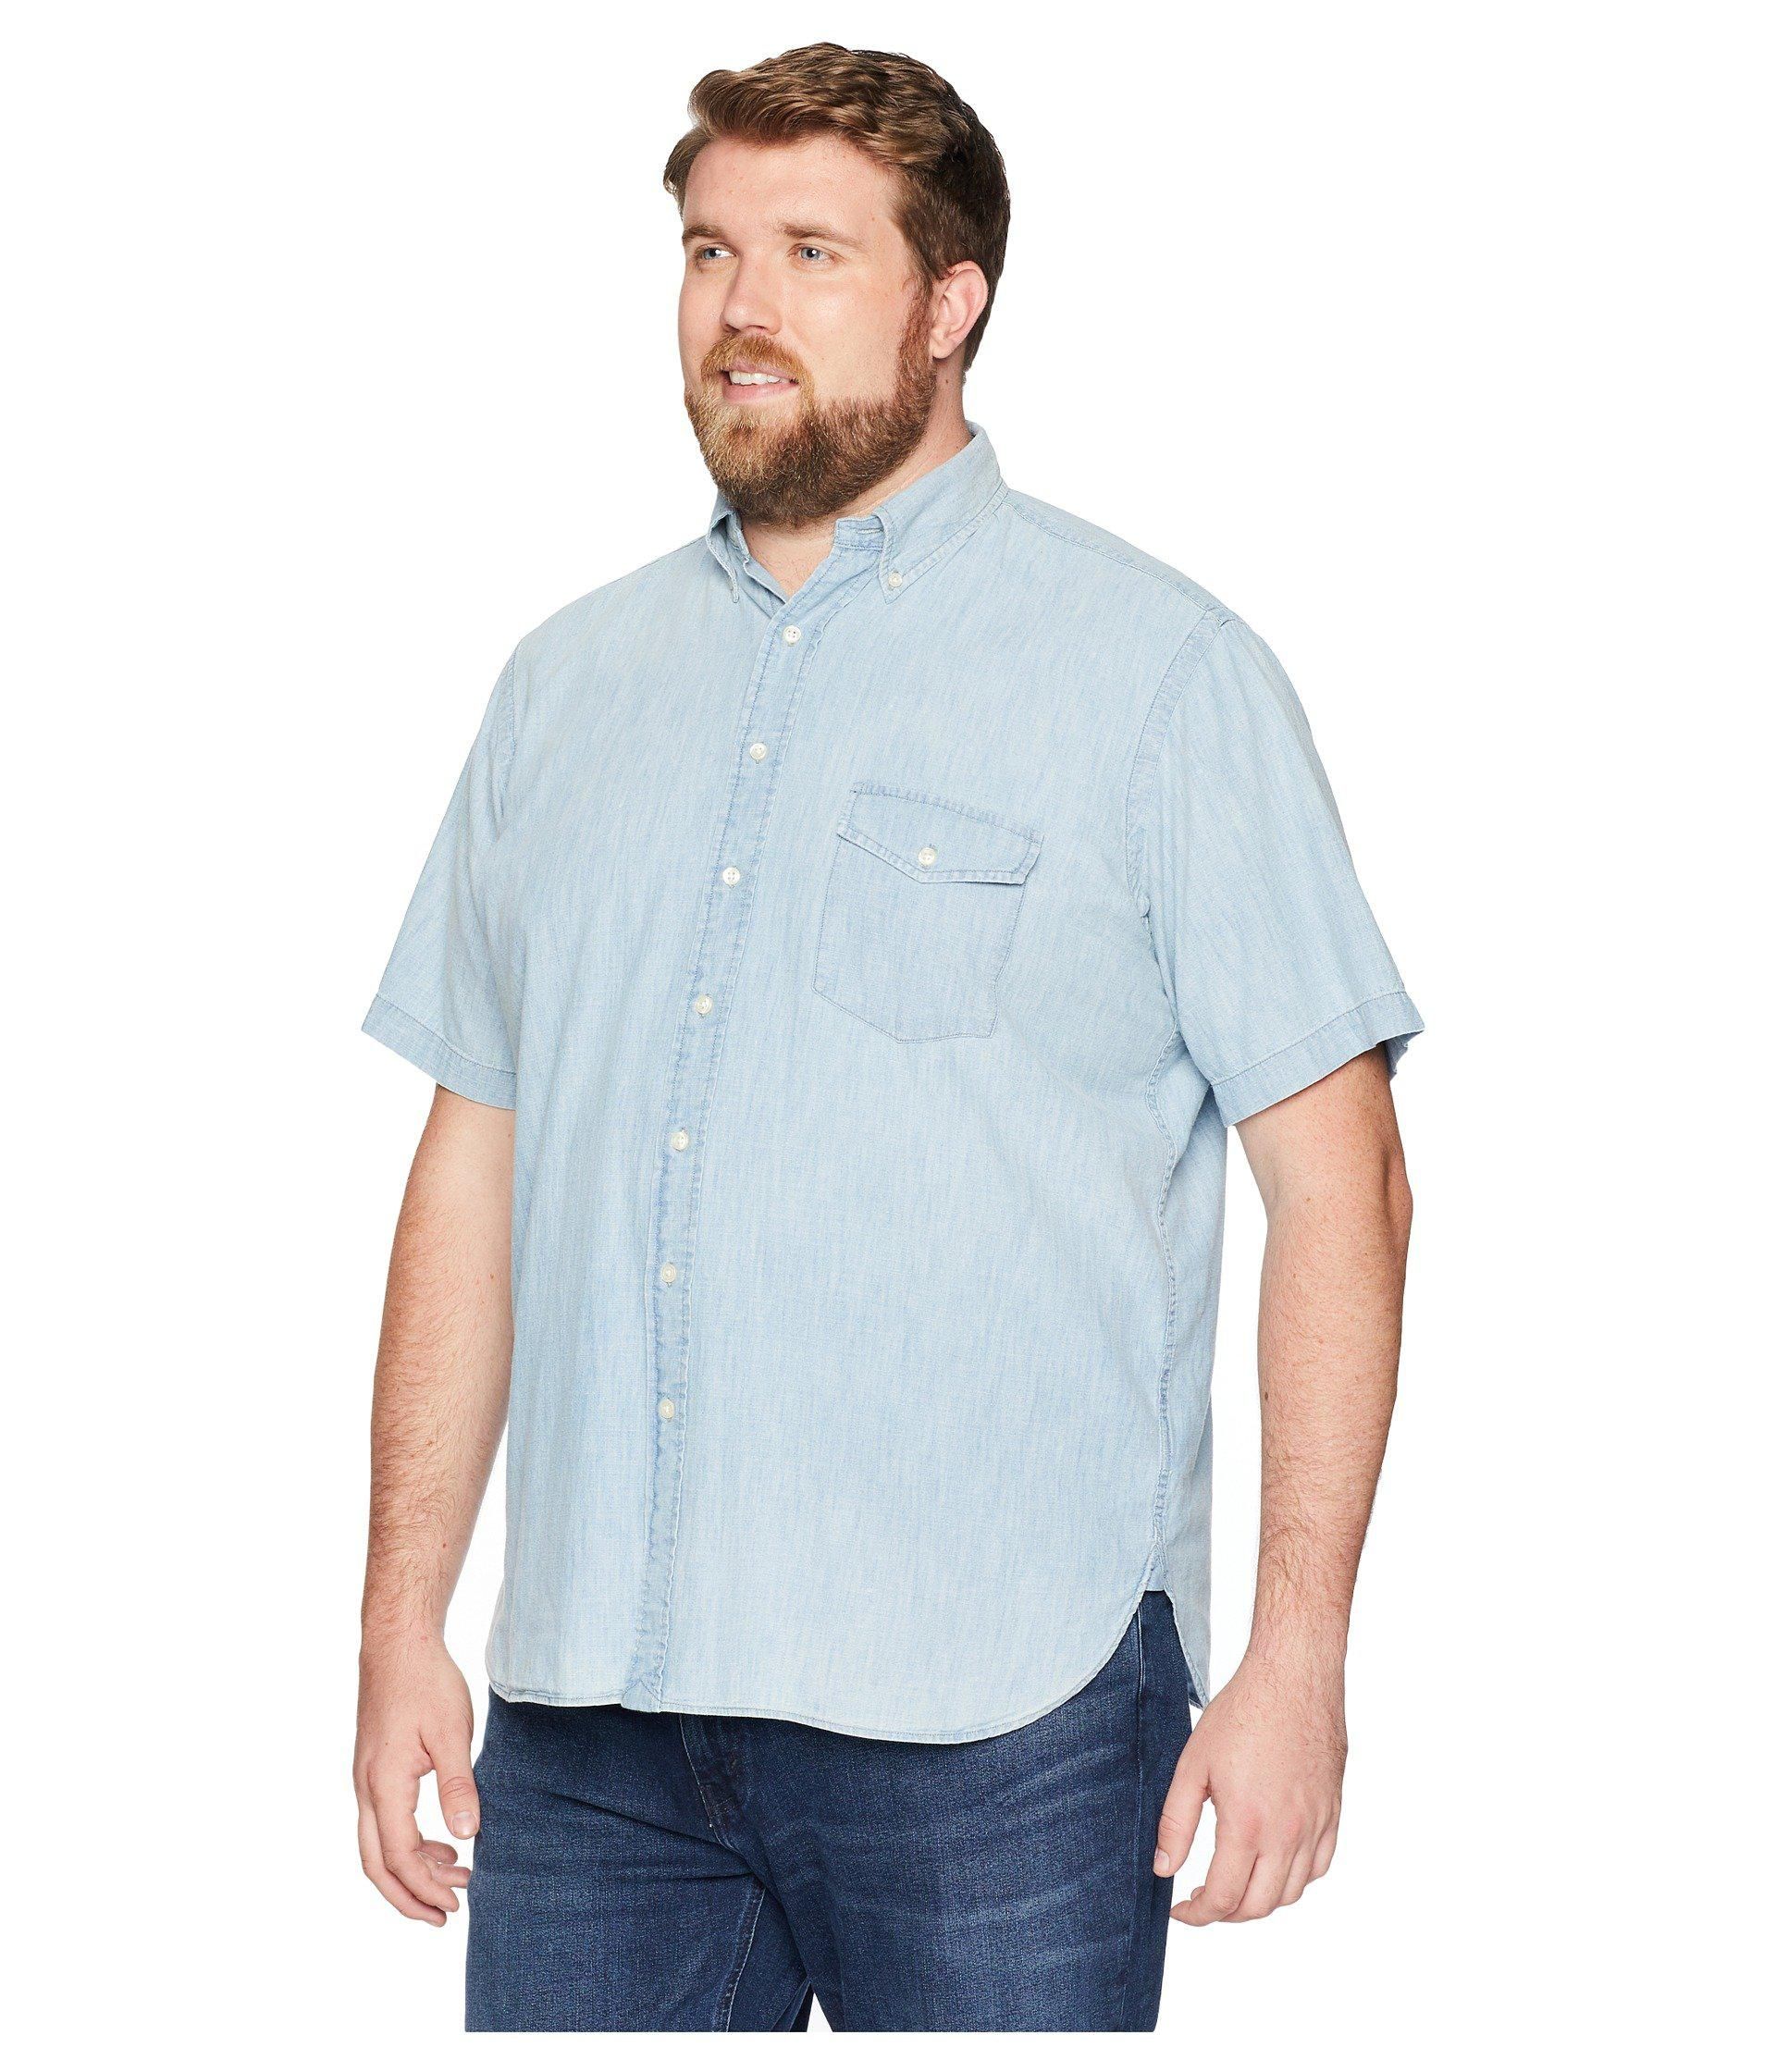 4dbdf6205 ... greece lyst polo ralph lauren big tall chambray short sleeve sport  shirt yacht blue white mens